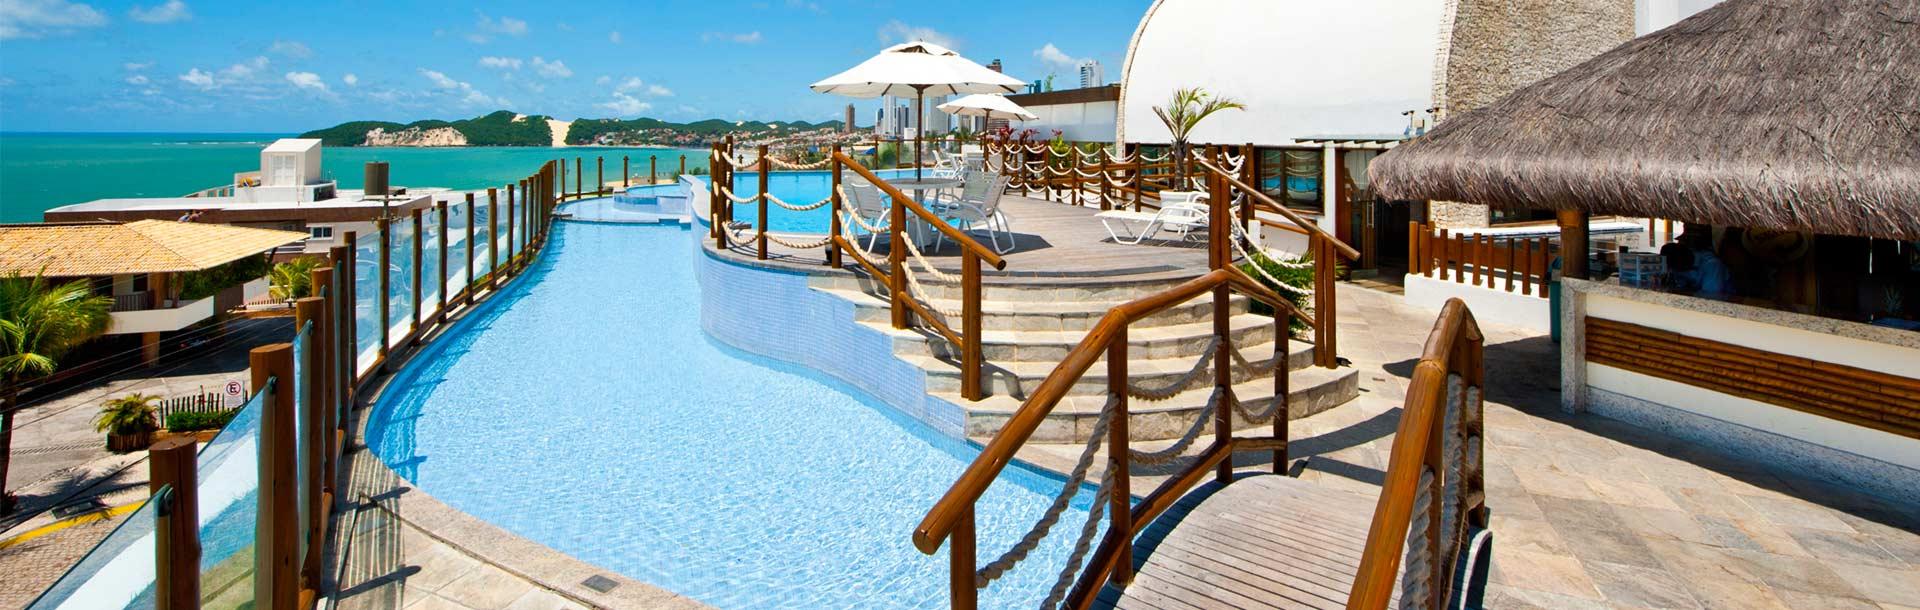 slider-interno-pontalmar-praia-hotel-lazer